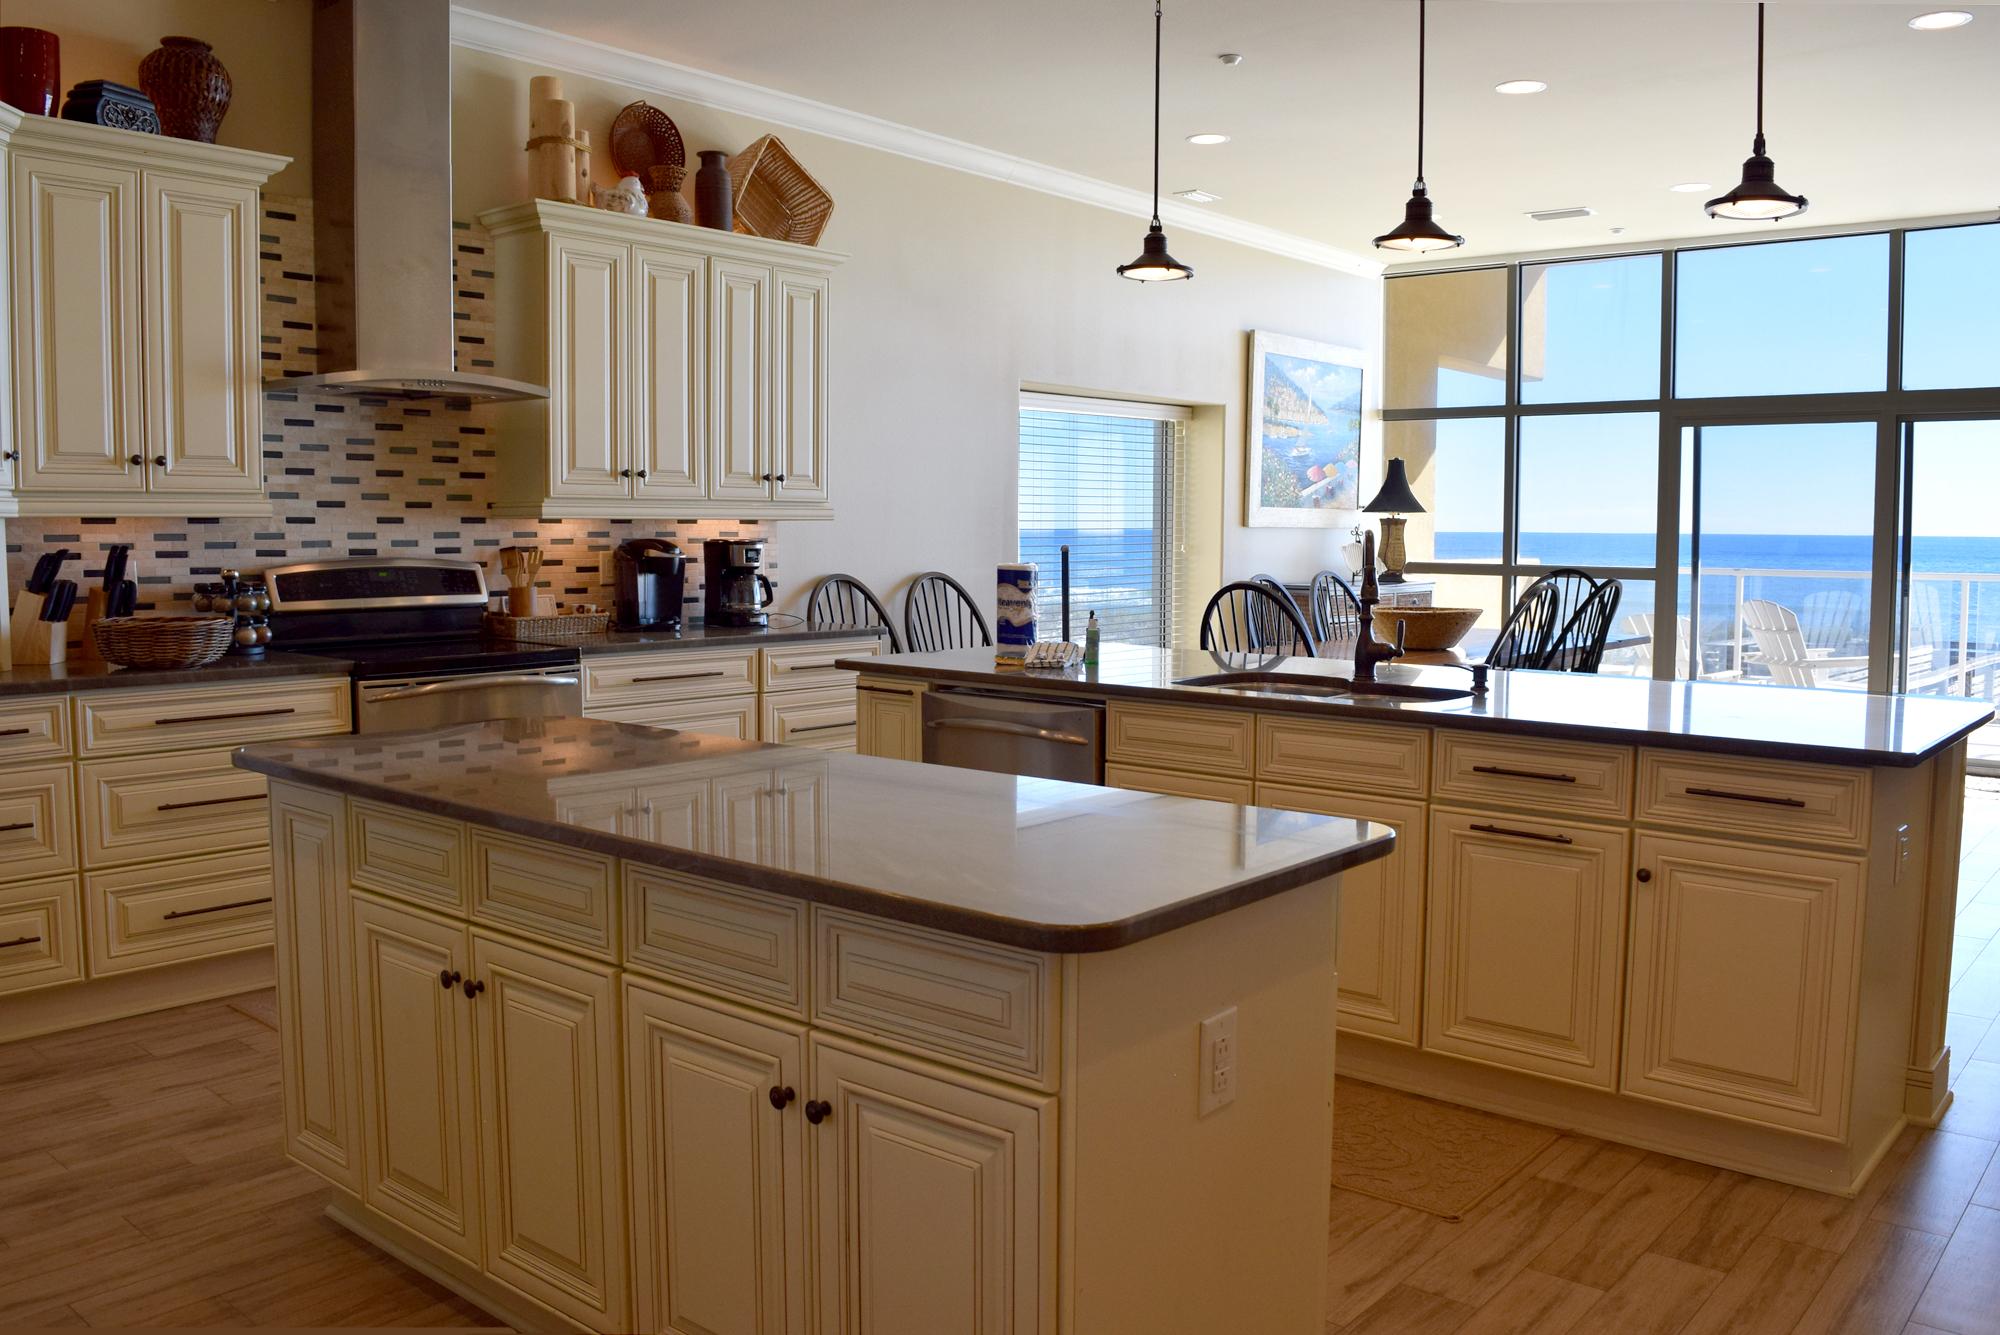 Regency Cabanas #B1 Condo rental in Regency Cabanas Pensacola Beach in Pensacola Beach Florida - #1